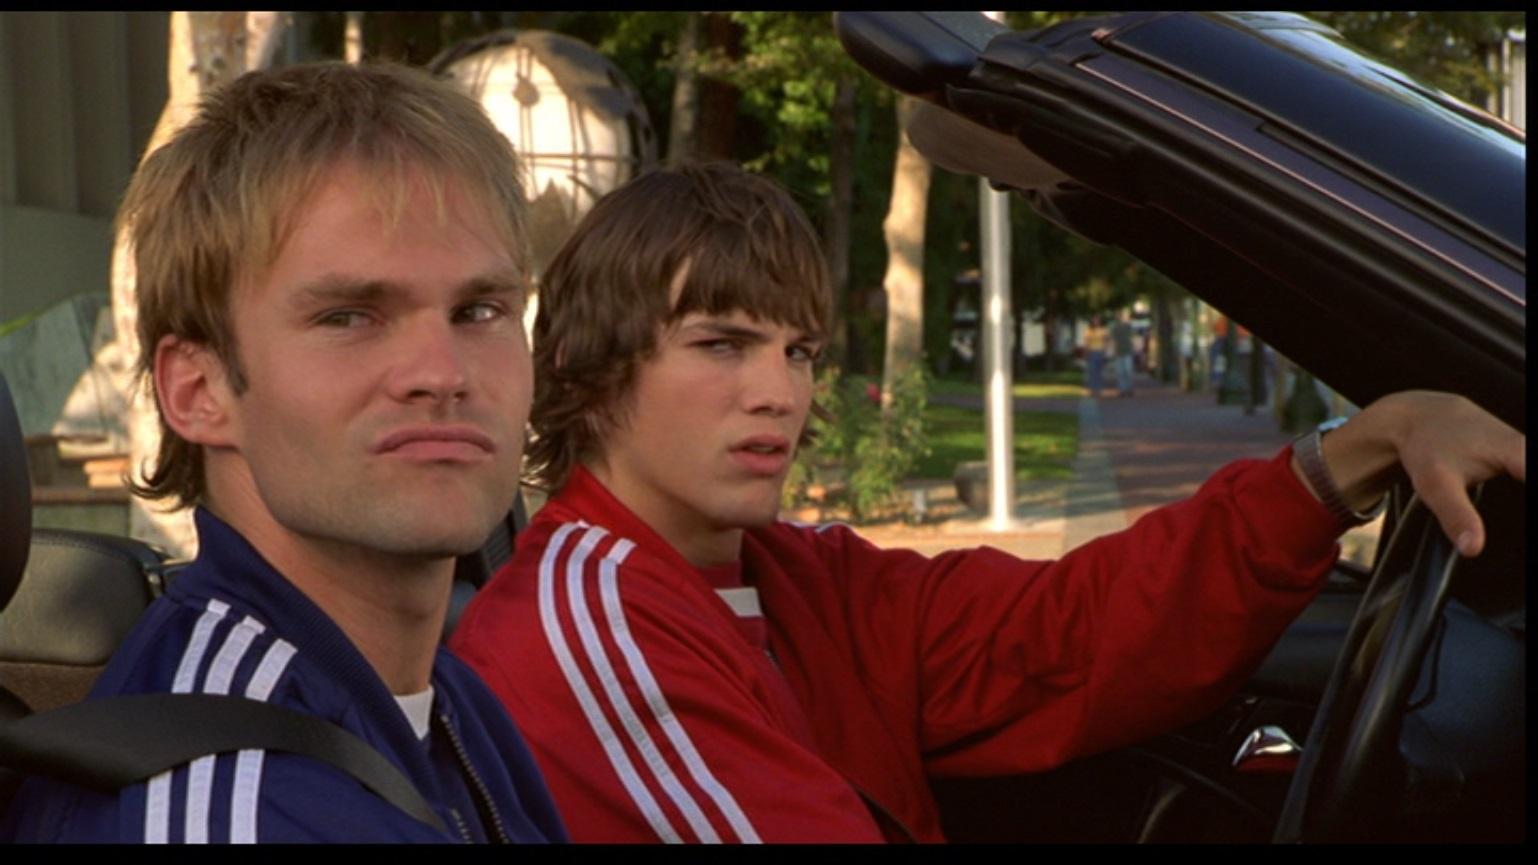 Happyotter: DUDE, WHERE'S MY CAR? (2000